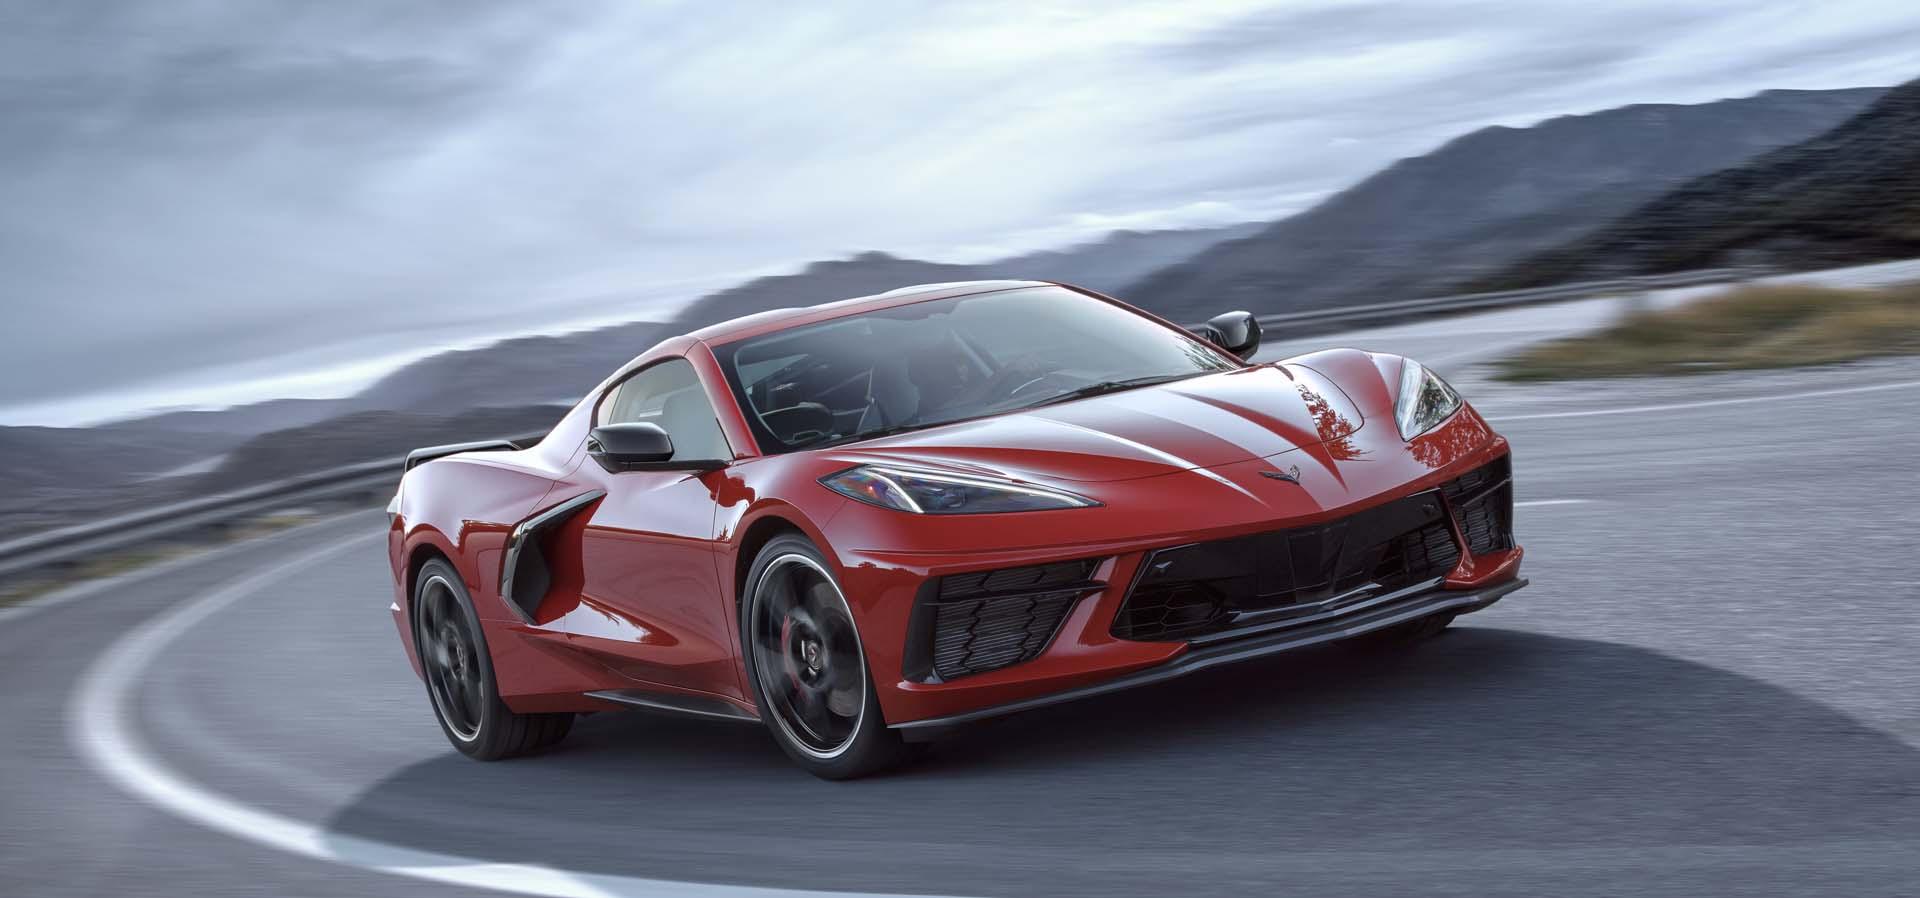 Base 2020 Chevrolet Corvette Stingray to boast 490 hp